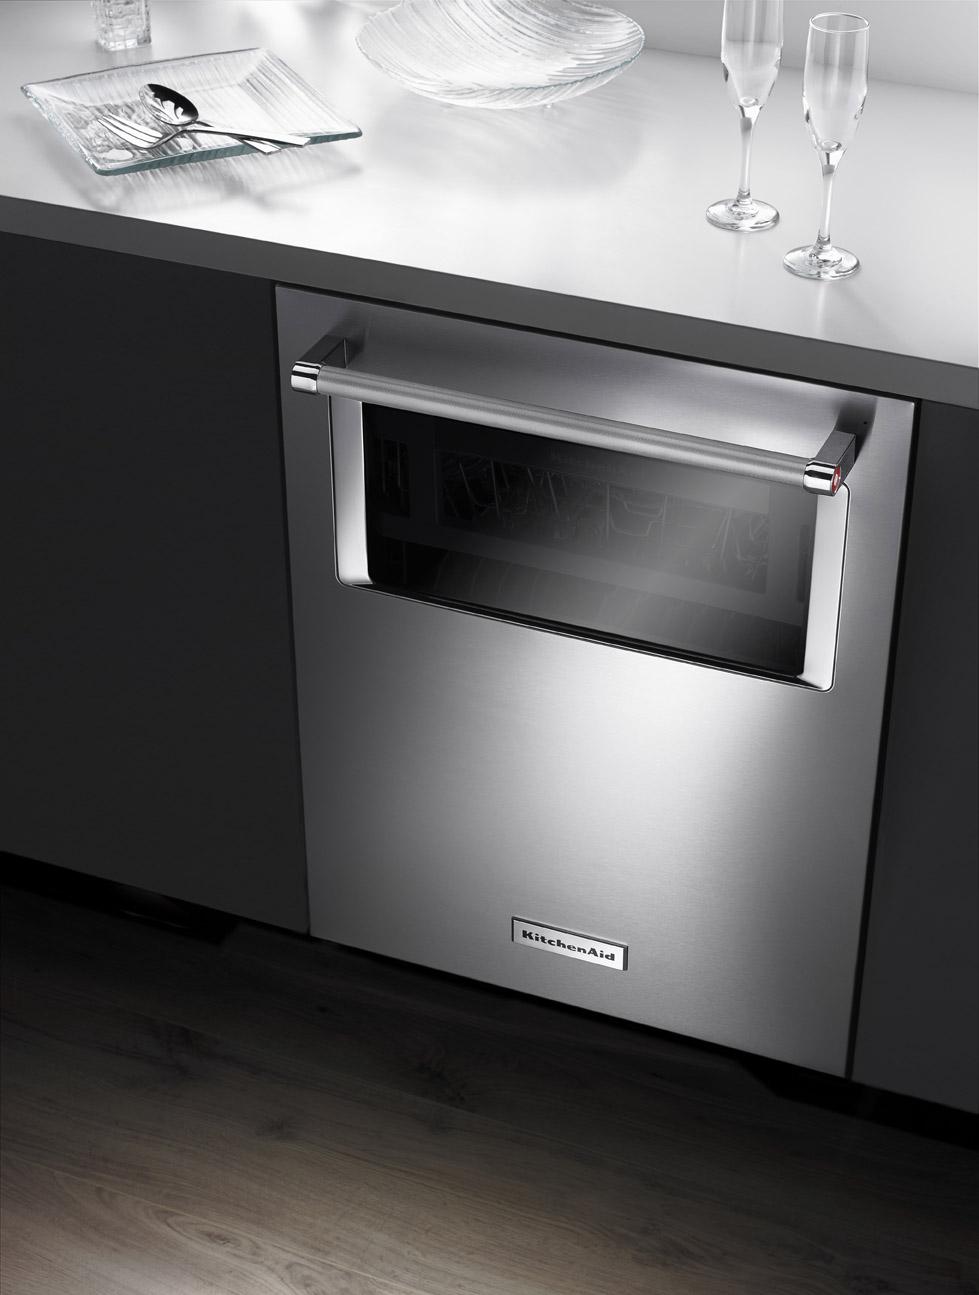 Kitchenaid Opens A Window On Dishwashing Remodeling